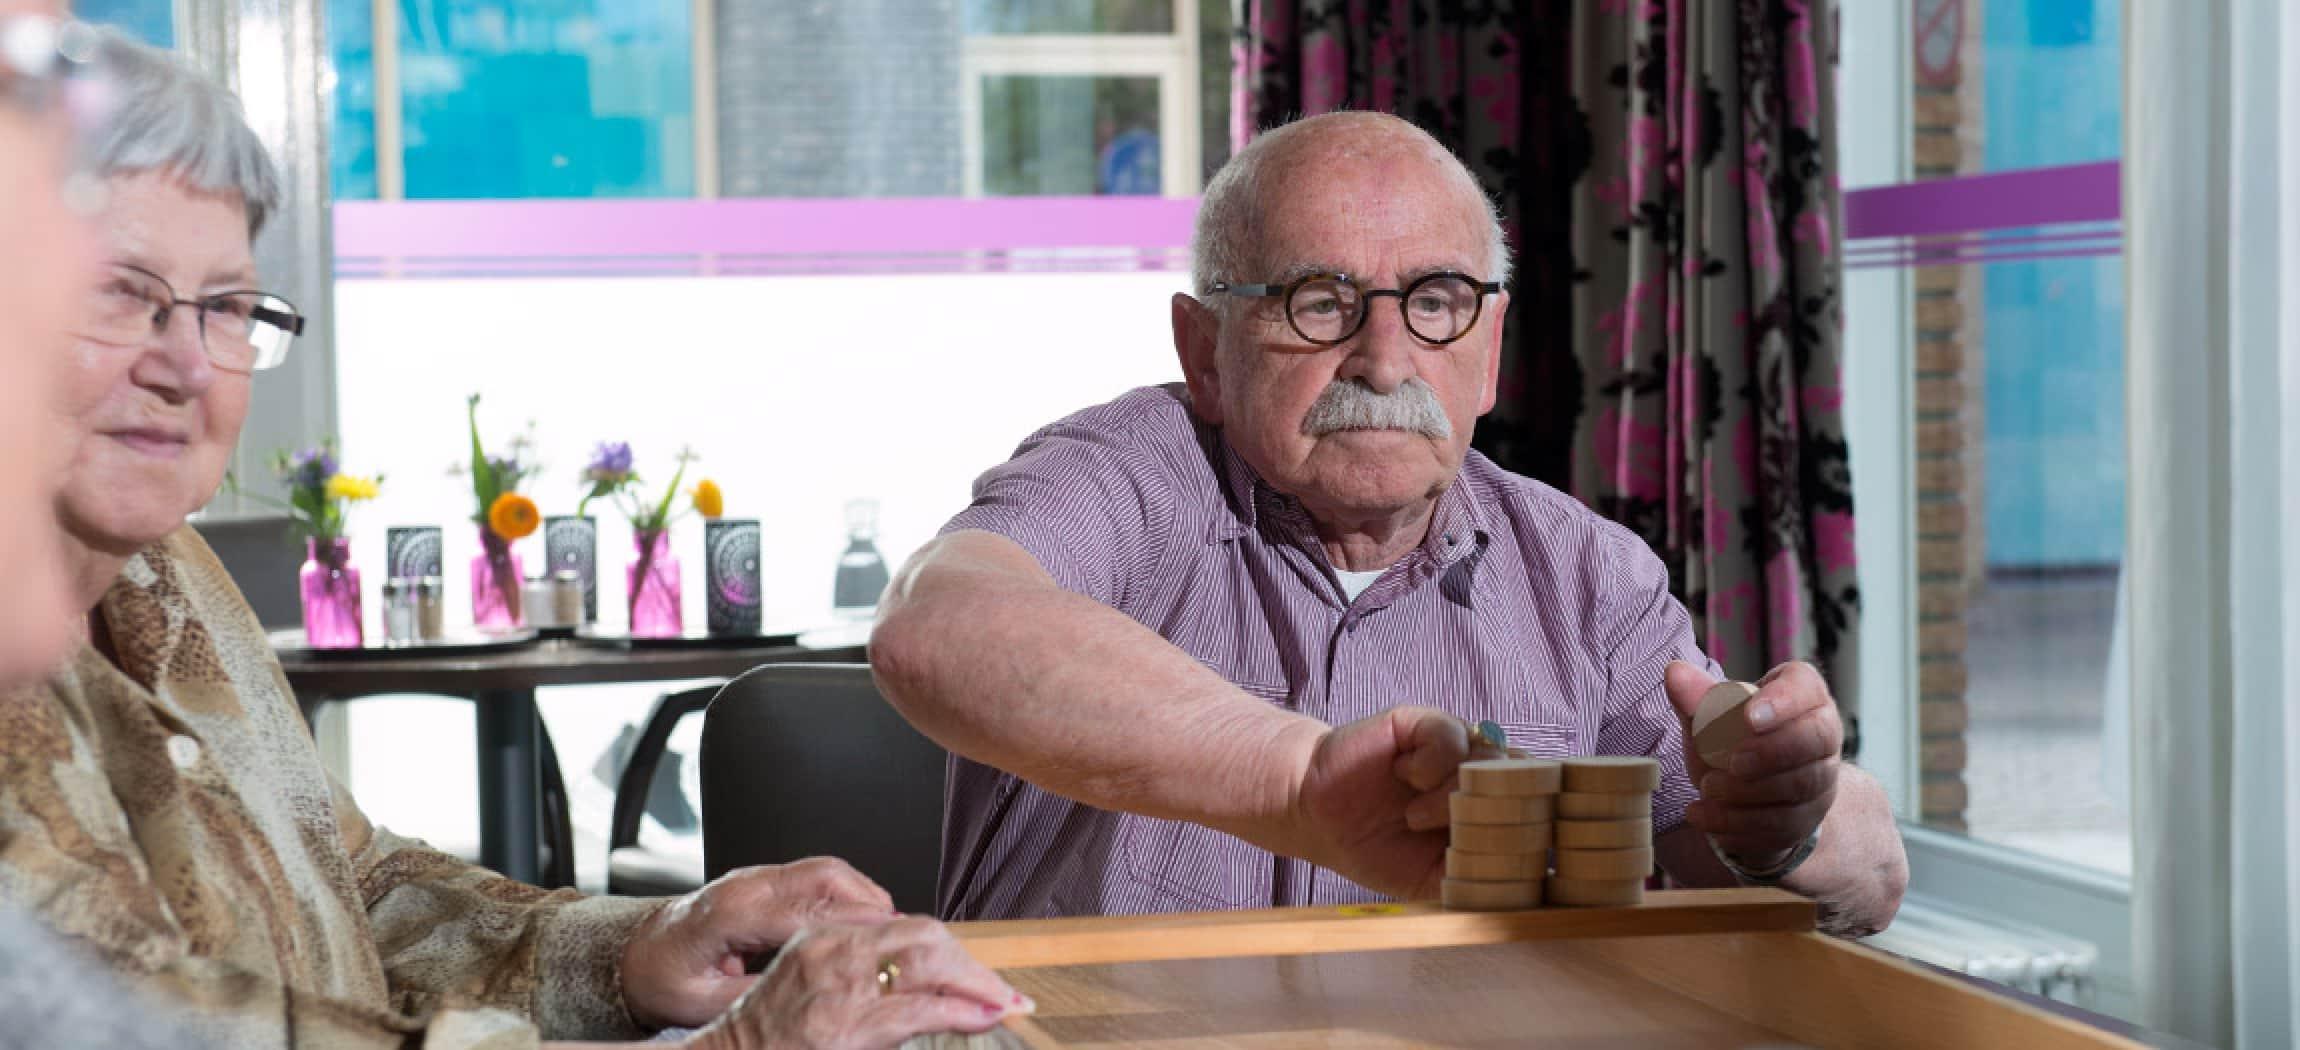 Sjoelen: oudere man met snor en bril speelt het Oud-Hollandse spel sjoelen